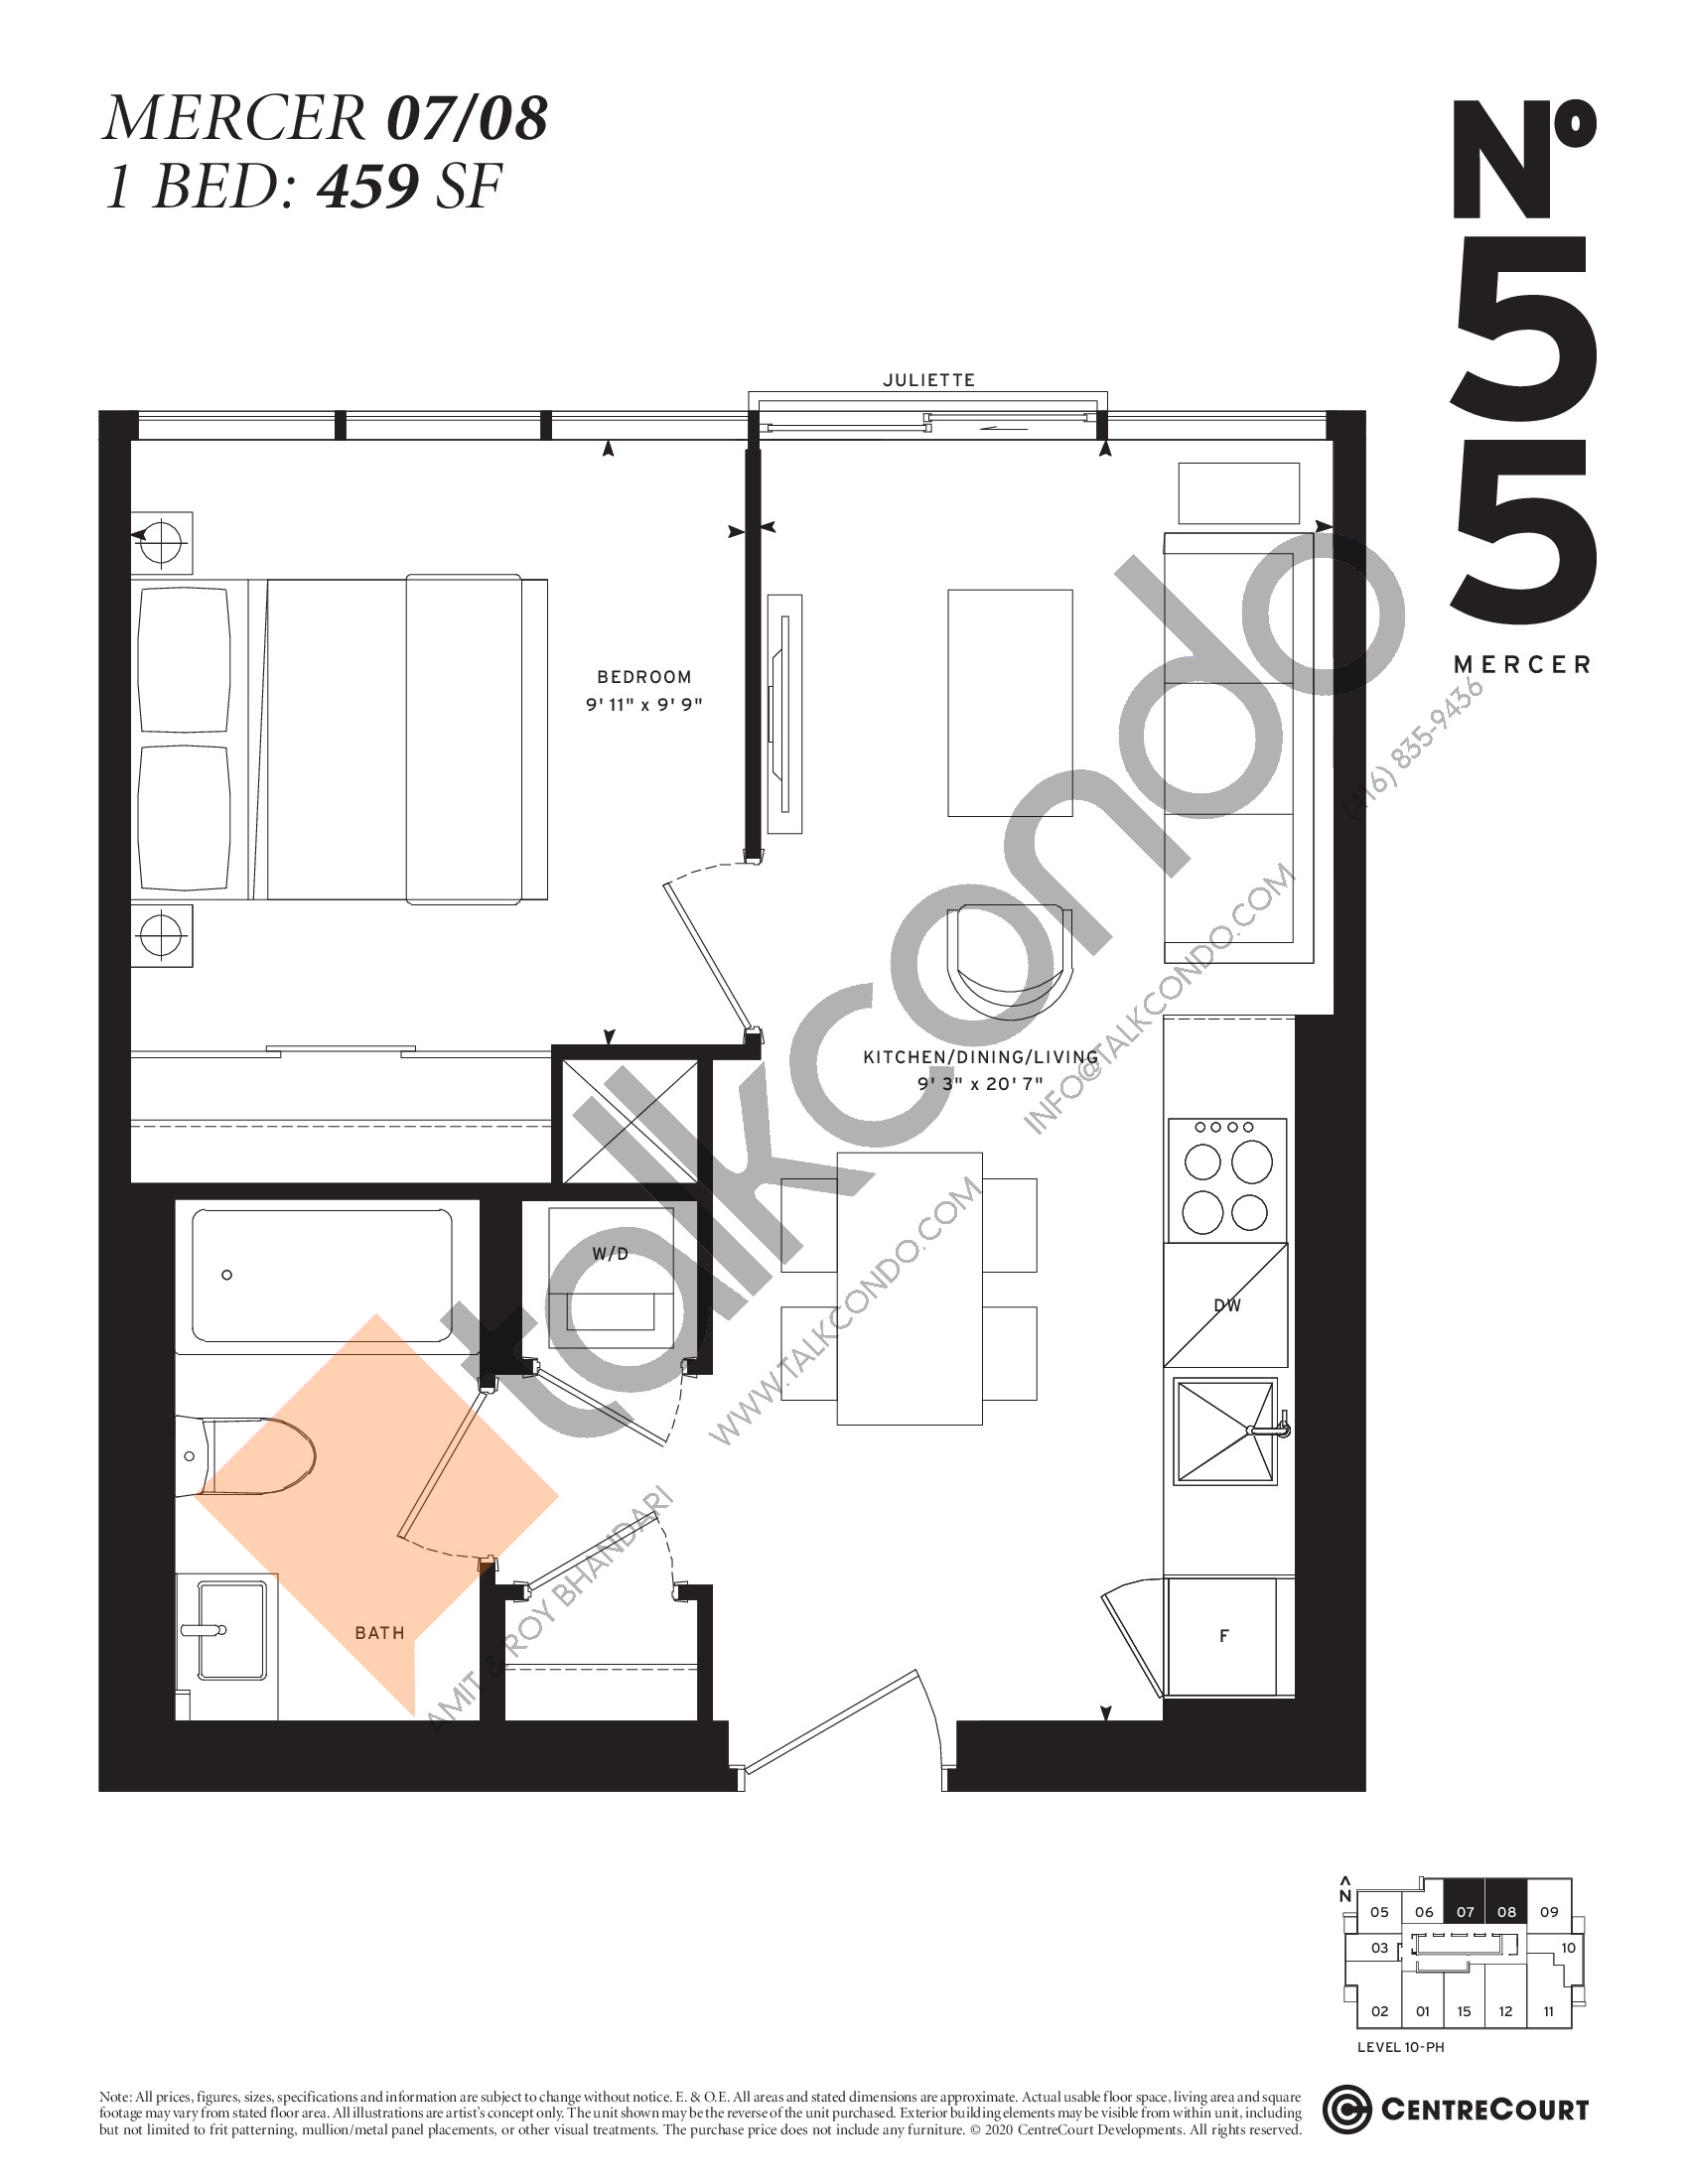 Mercer 07/08 Floor Plan at No. 55 Mercer Condos - 459 sq.ft